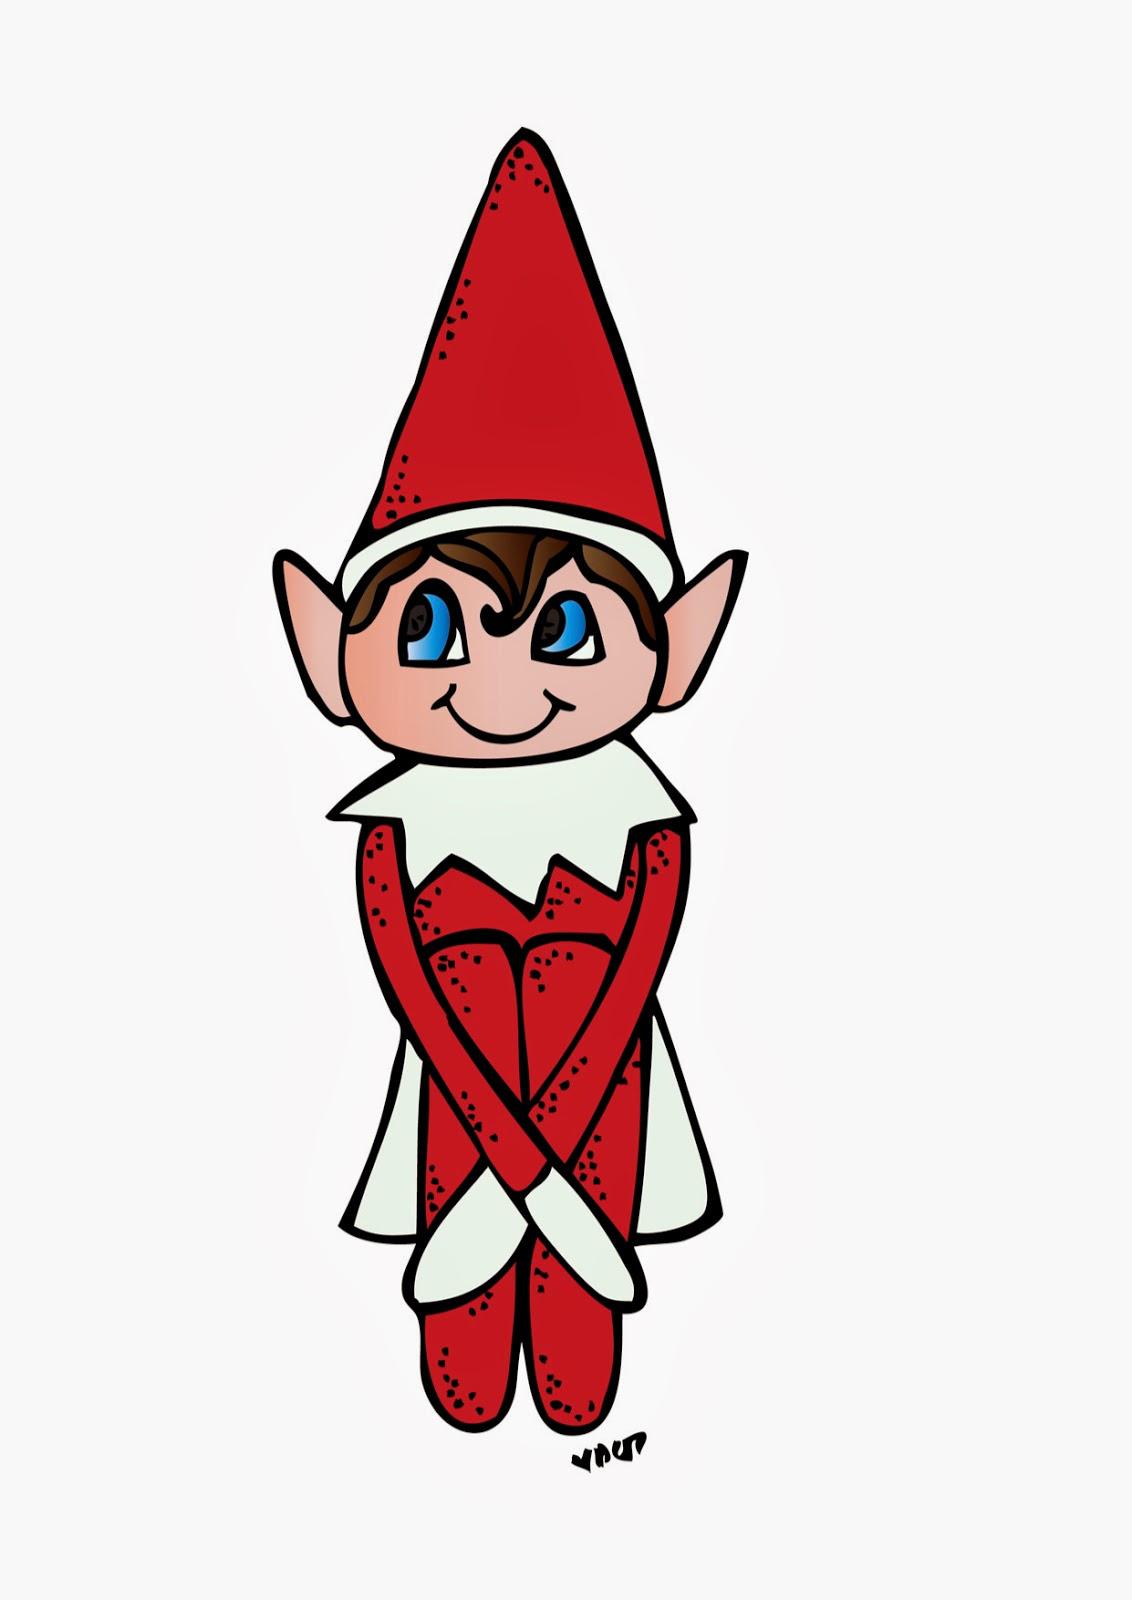 1132x1600 Elf On The Shelf Clipart Clipart Suggest, Teacher Clip Art Shelves